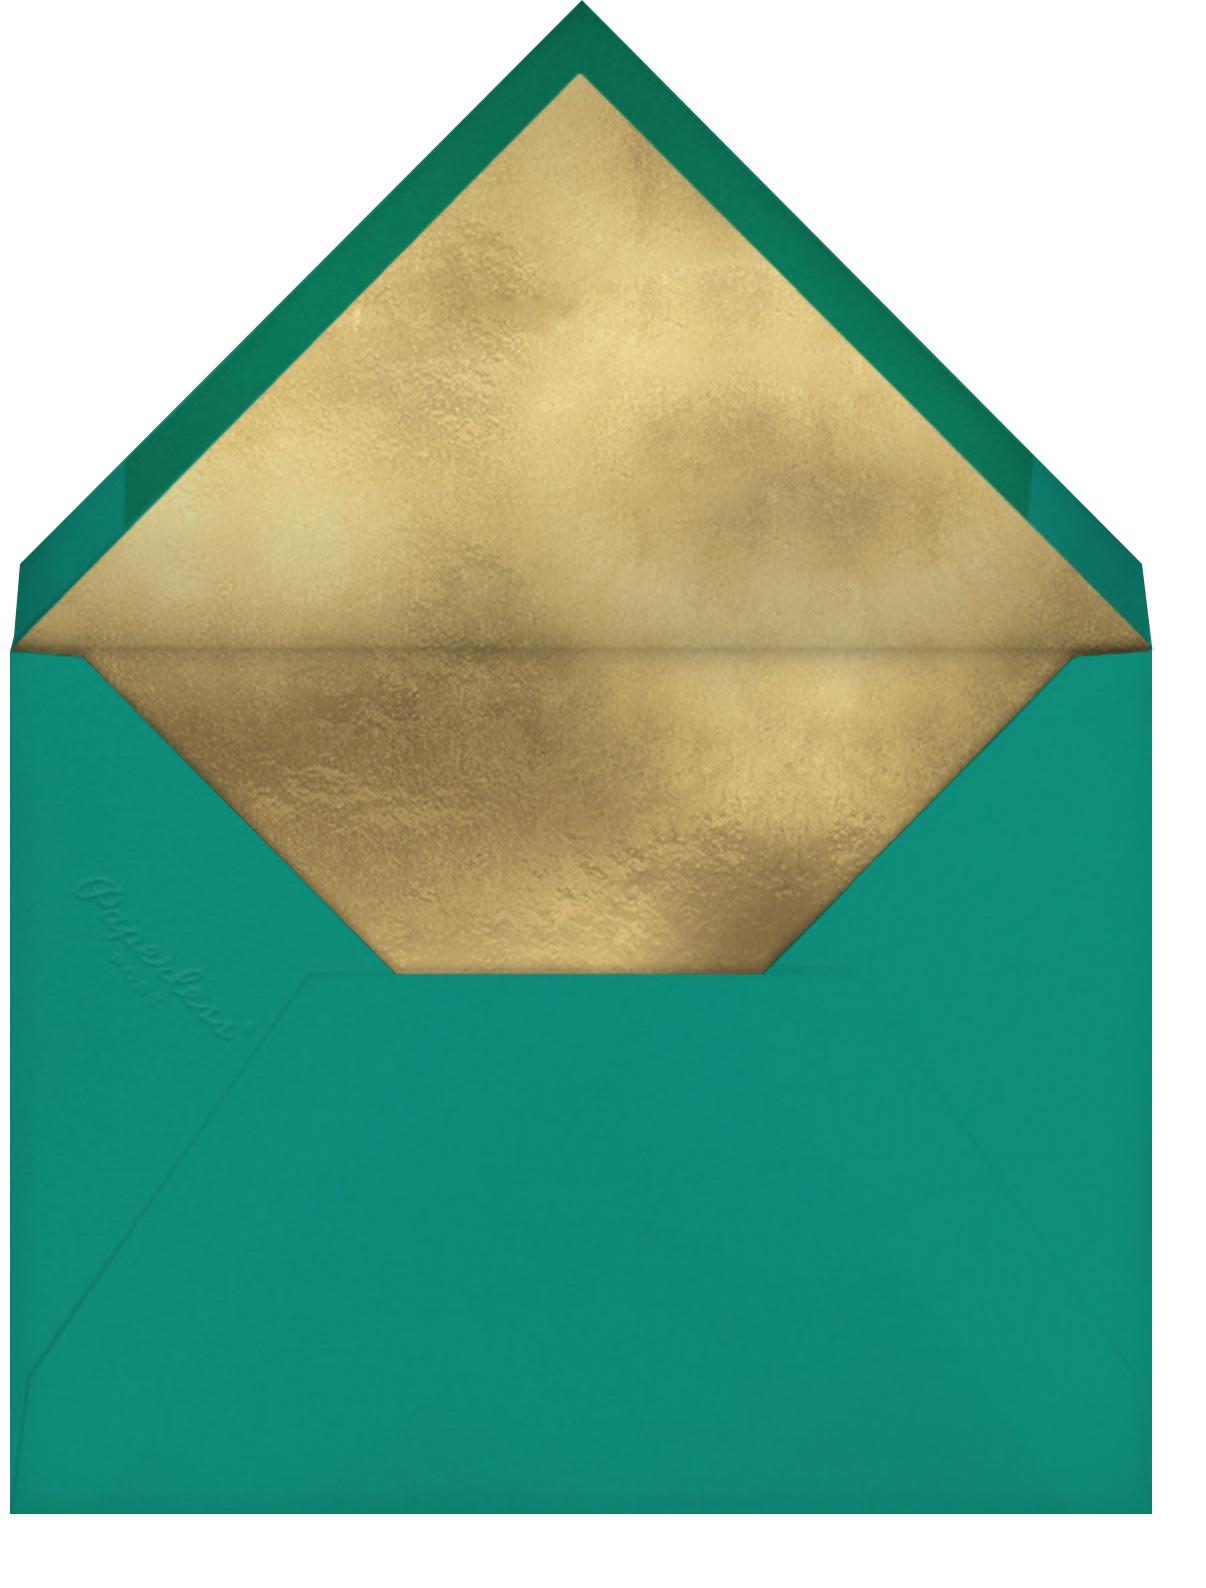 Joyful Eid (Greeting) - Amazon - Paperless Post - Ramadan and Eid - envelope back